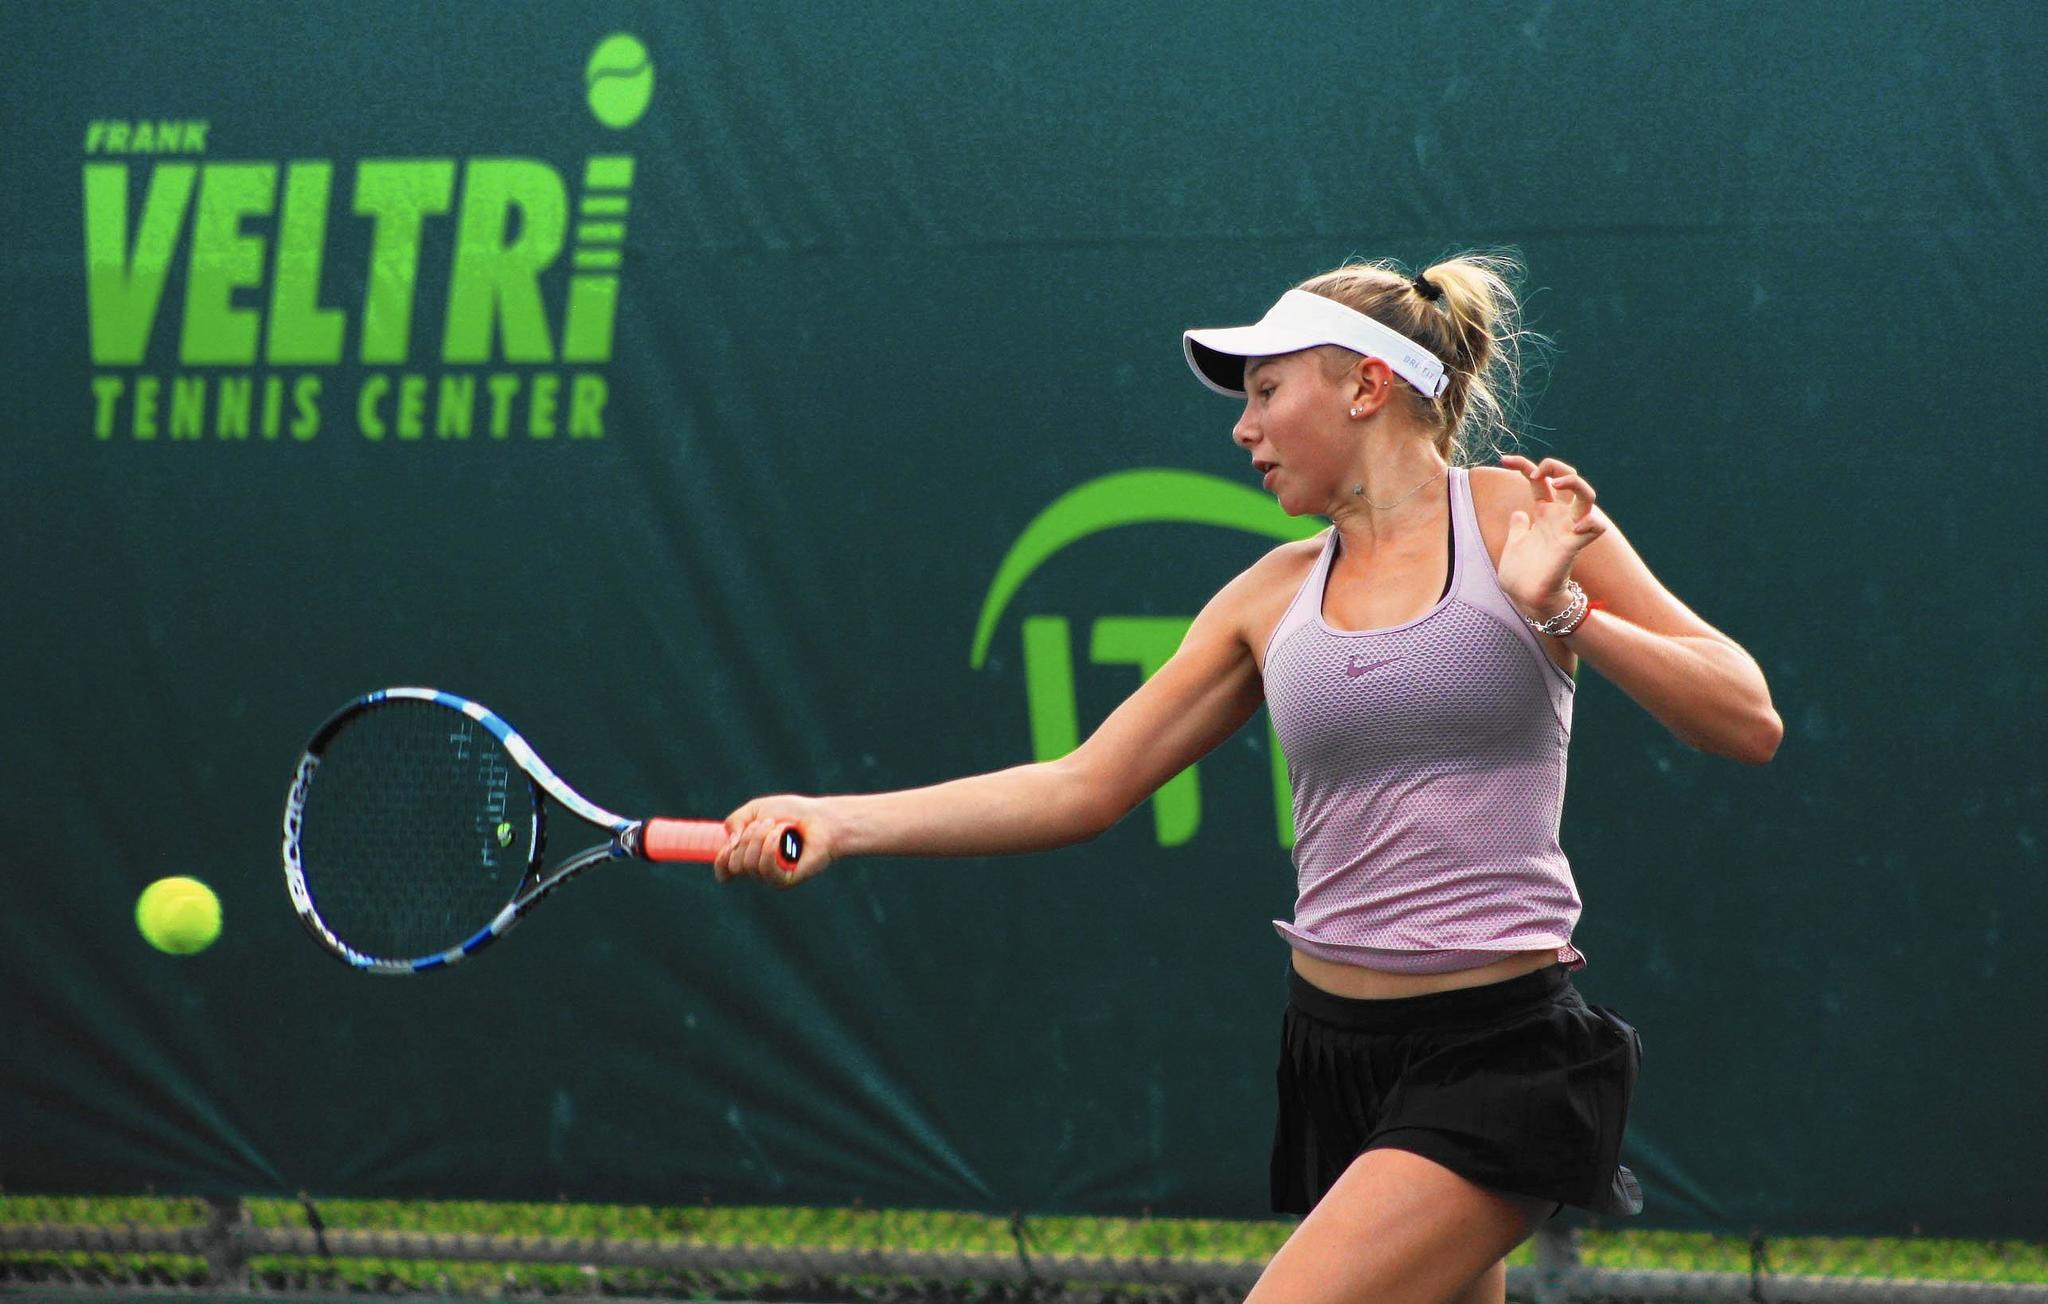 Amanda Anisimova pushing to build on breakthrough year in ...